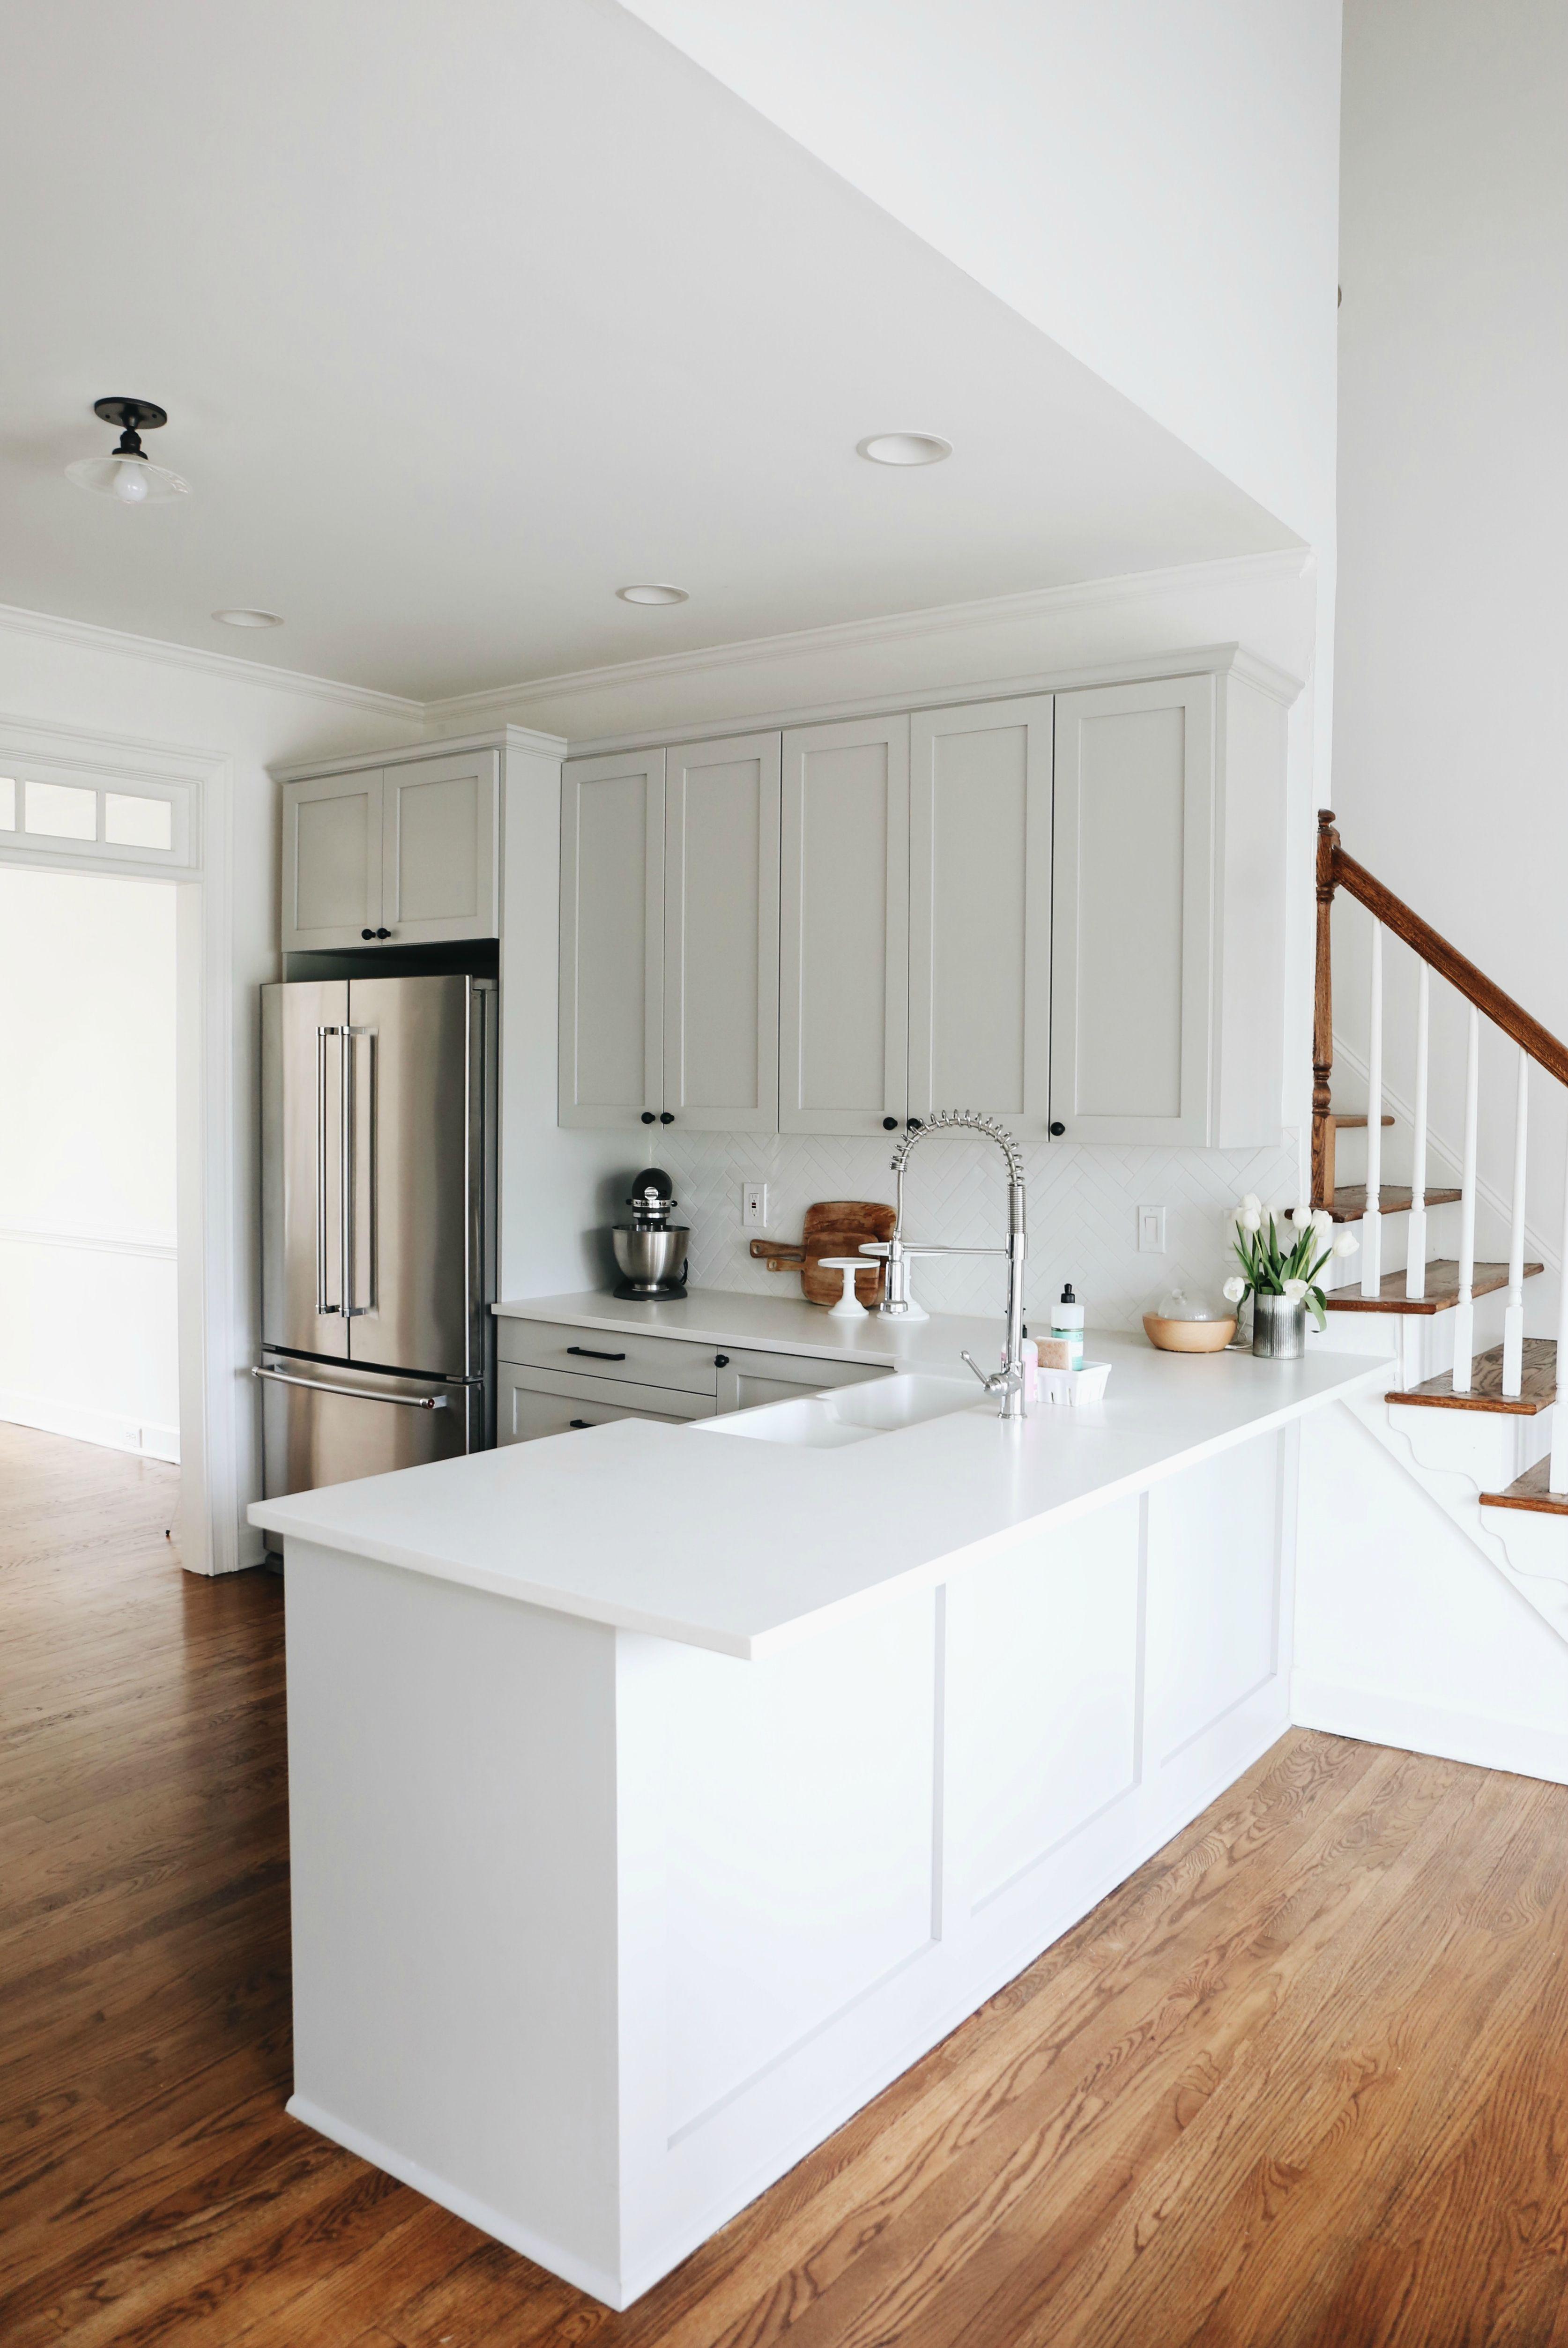 Our Kitchen Renovation Details | Herringbone backsplash, Gray ...